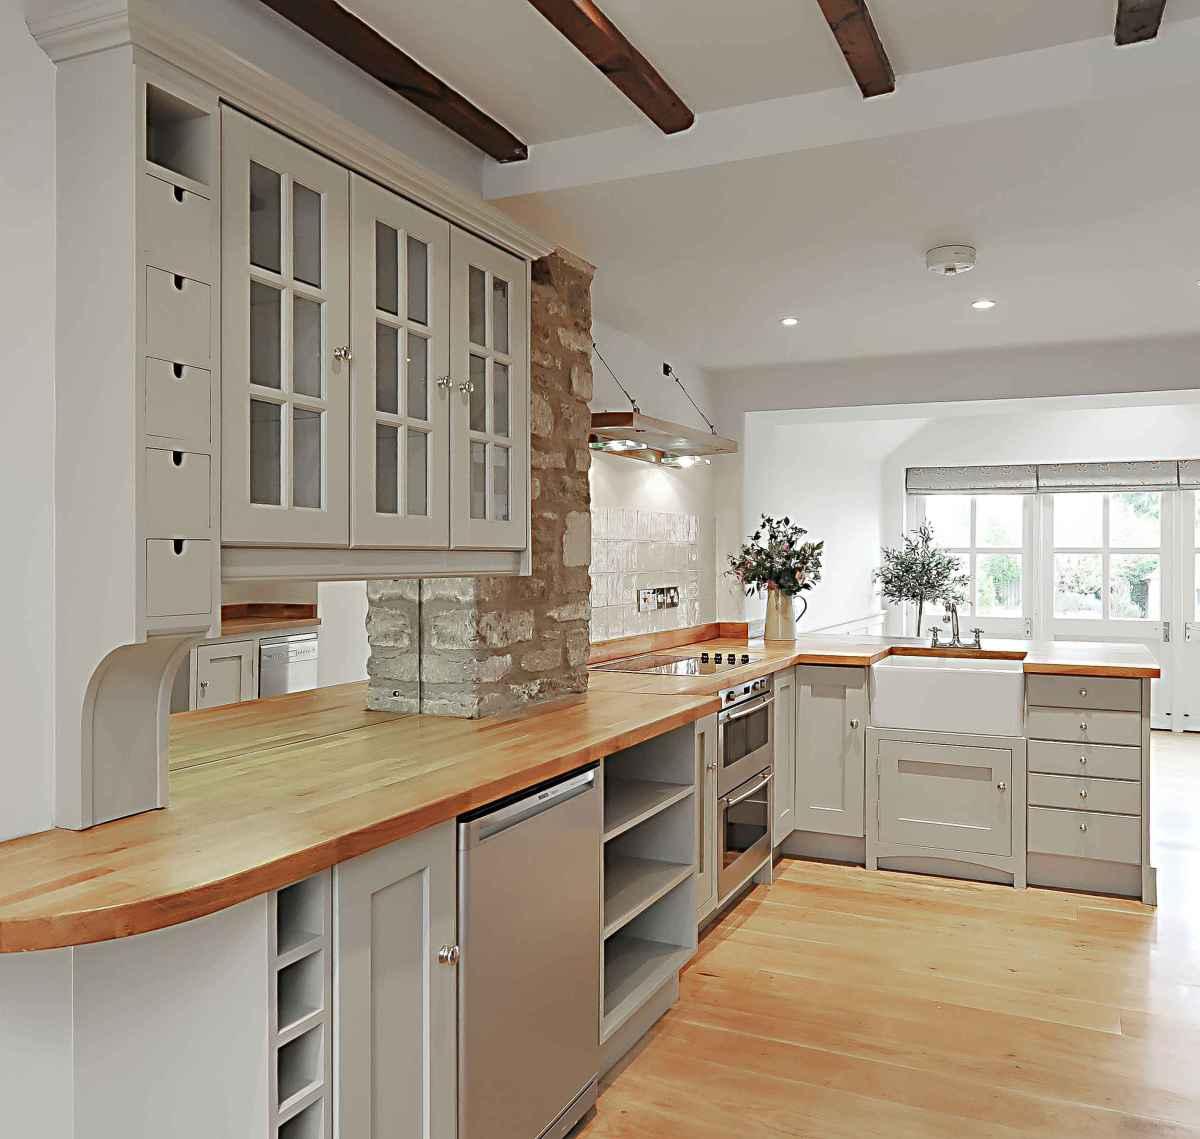 10 luxury modern kitchen ideas